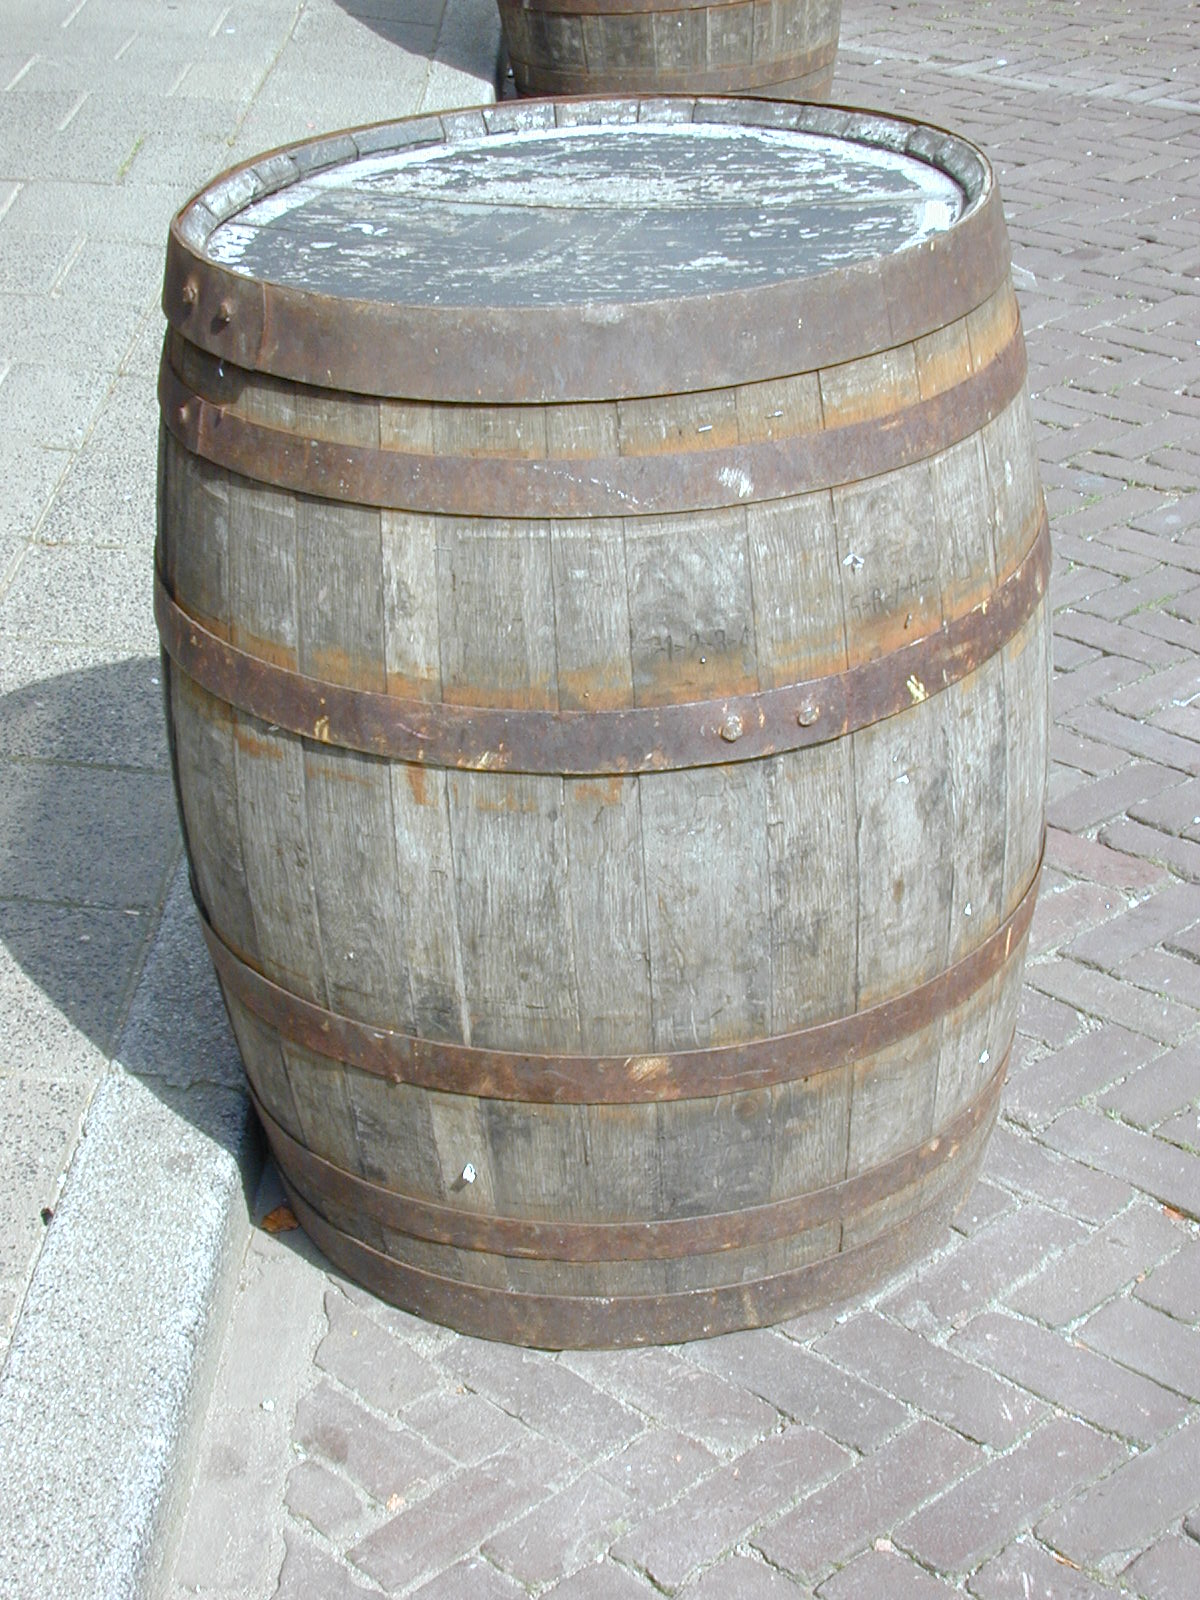 barrel keg beer wine winebarrel o 'o beerkeg iron rings planks bent wood